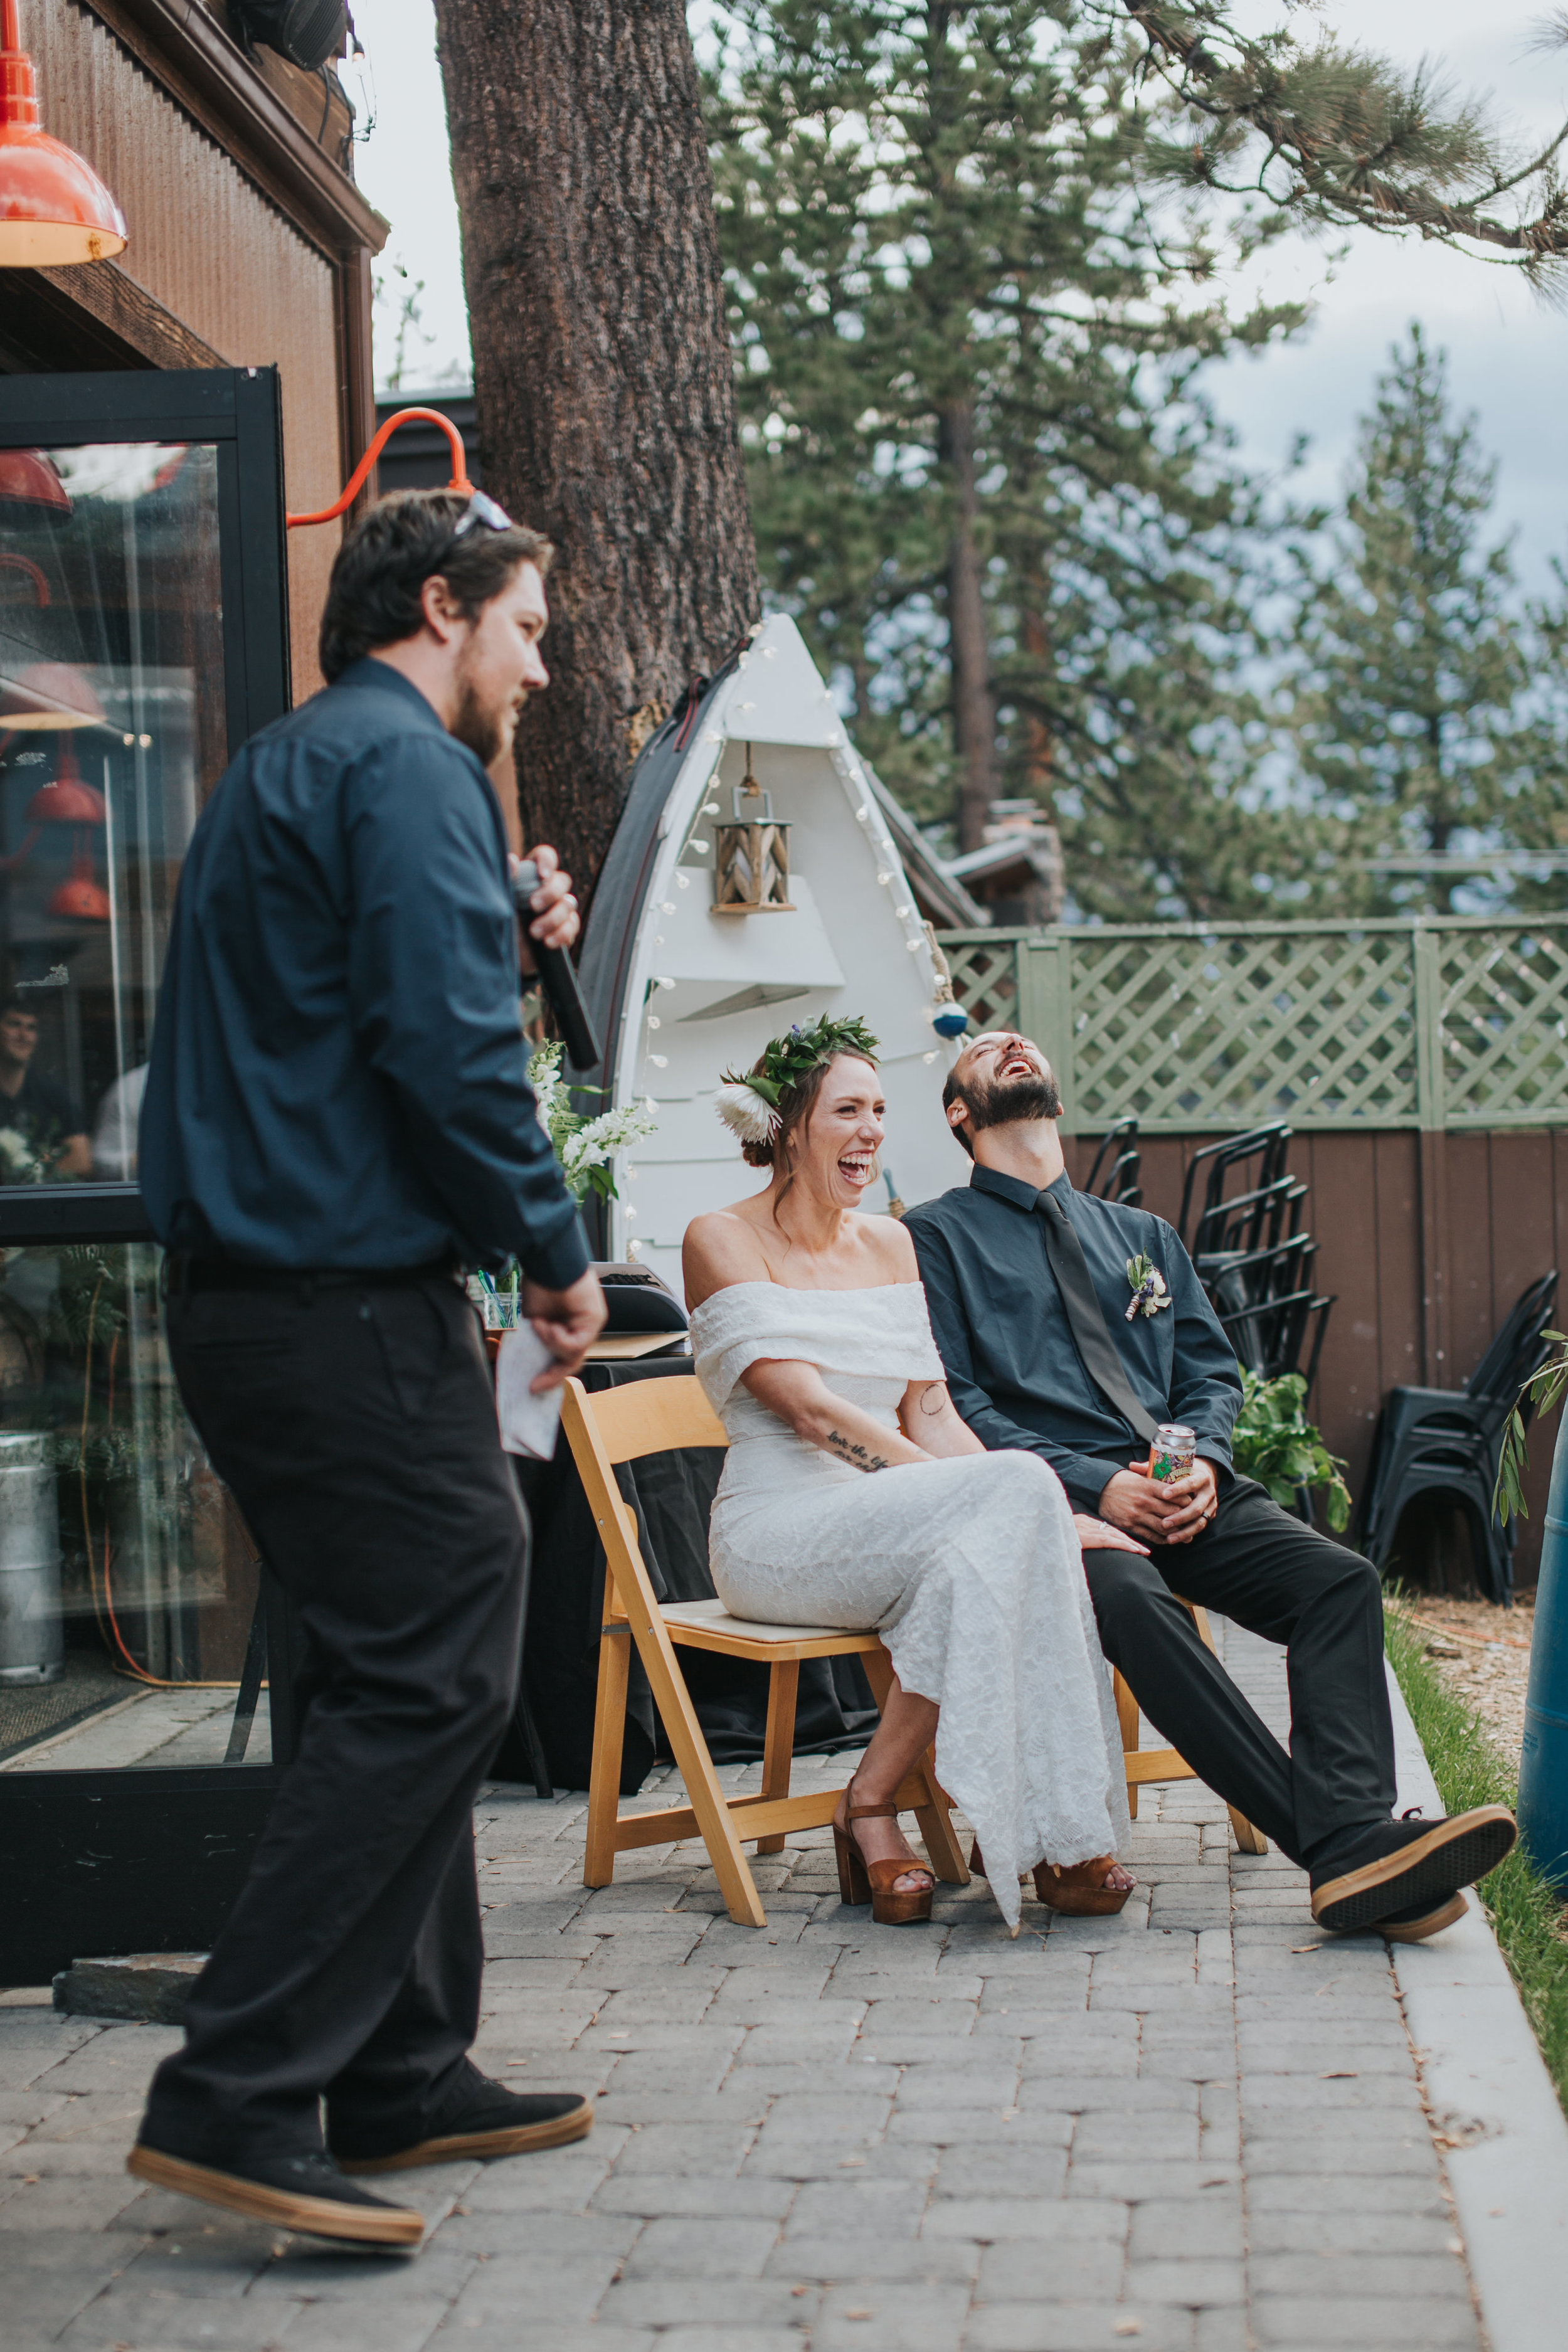 south-lake-tahoe-elopement-valerie-lendvay-photo-051.jpg